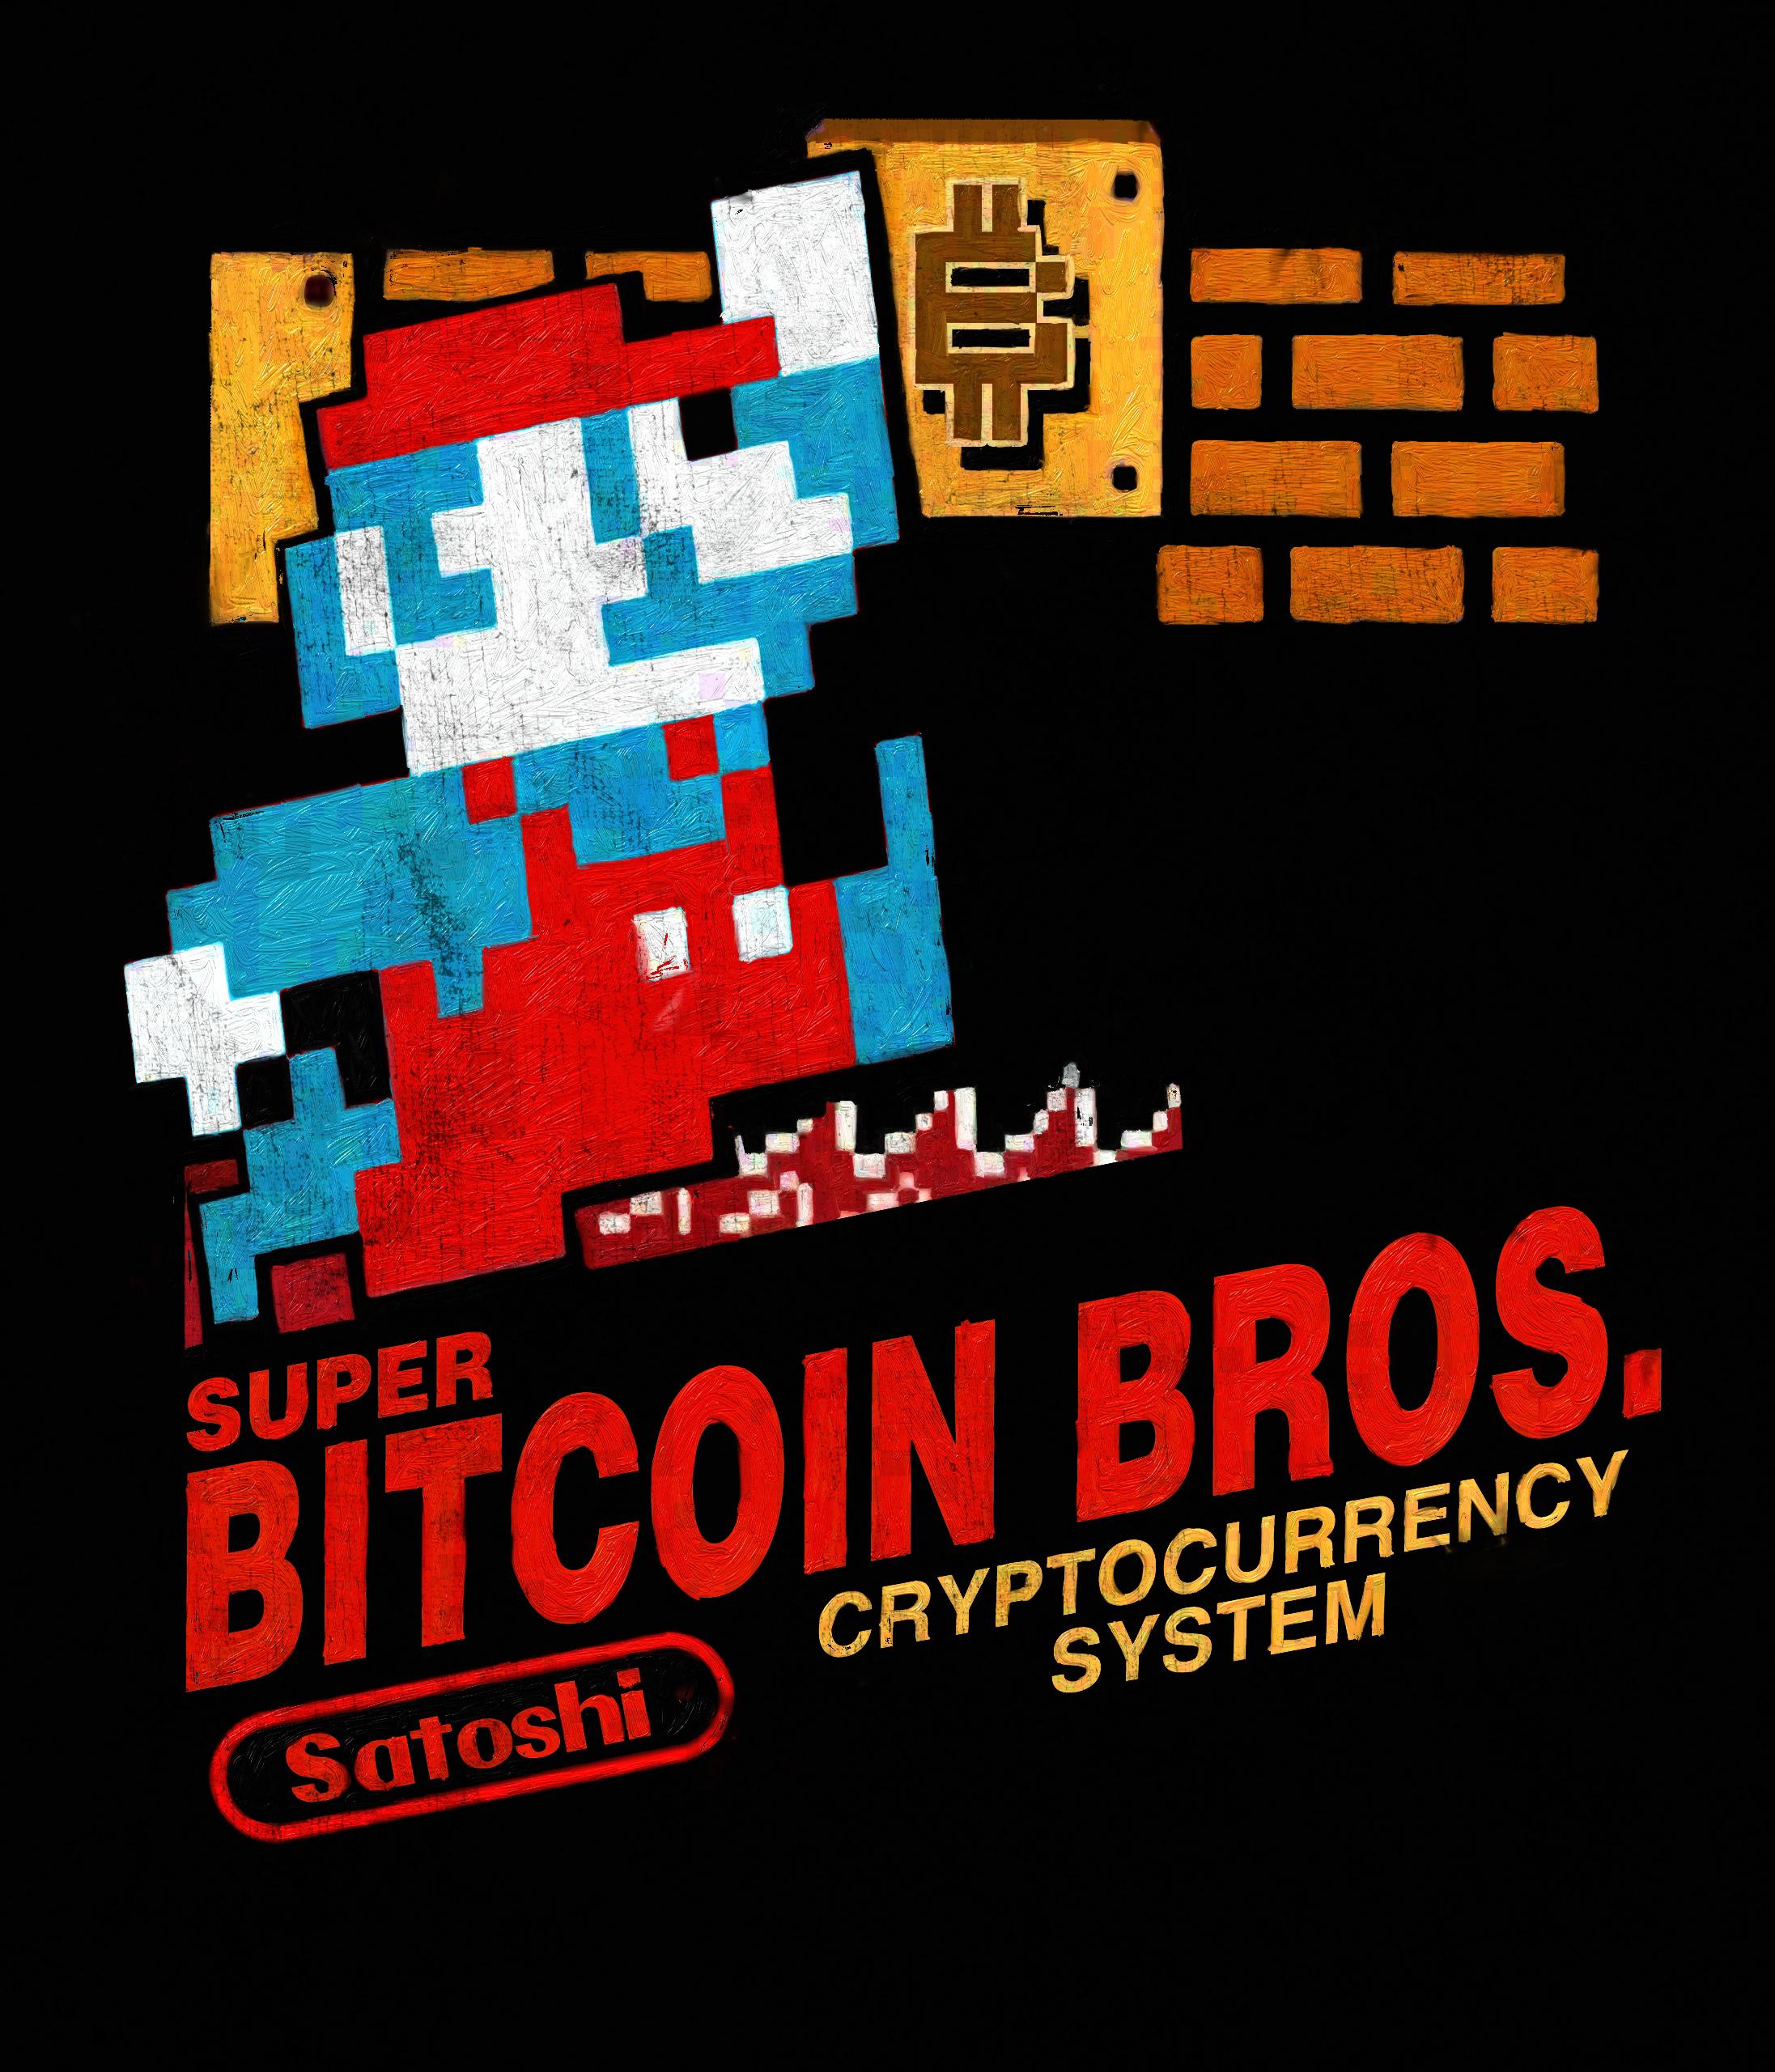 super_bitcoin_bros_by_mrddixon-d8shr6v (1)